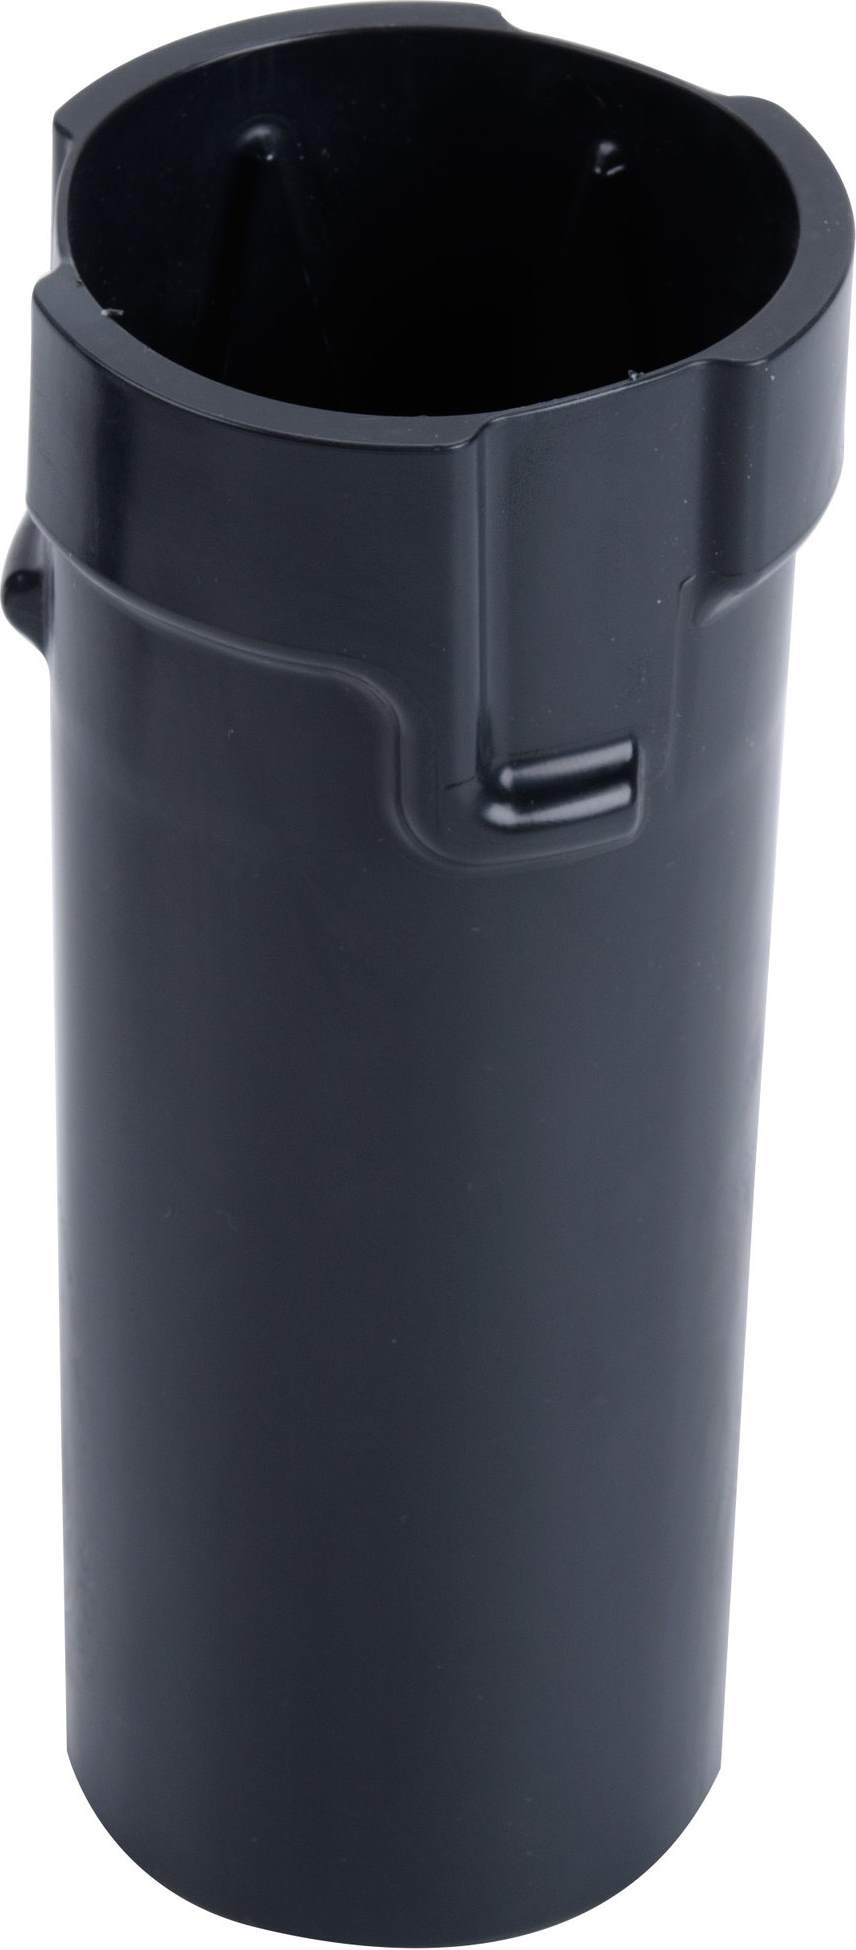 Диск-слайсер Robot Coupe 28194 (1мм) для петрушки - 6